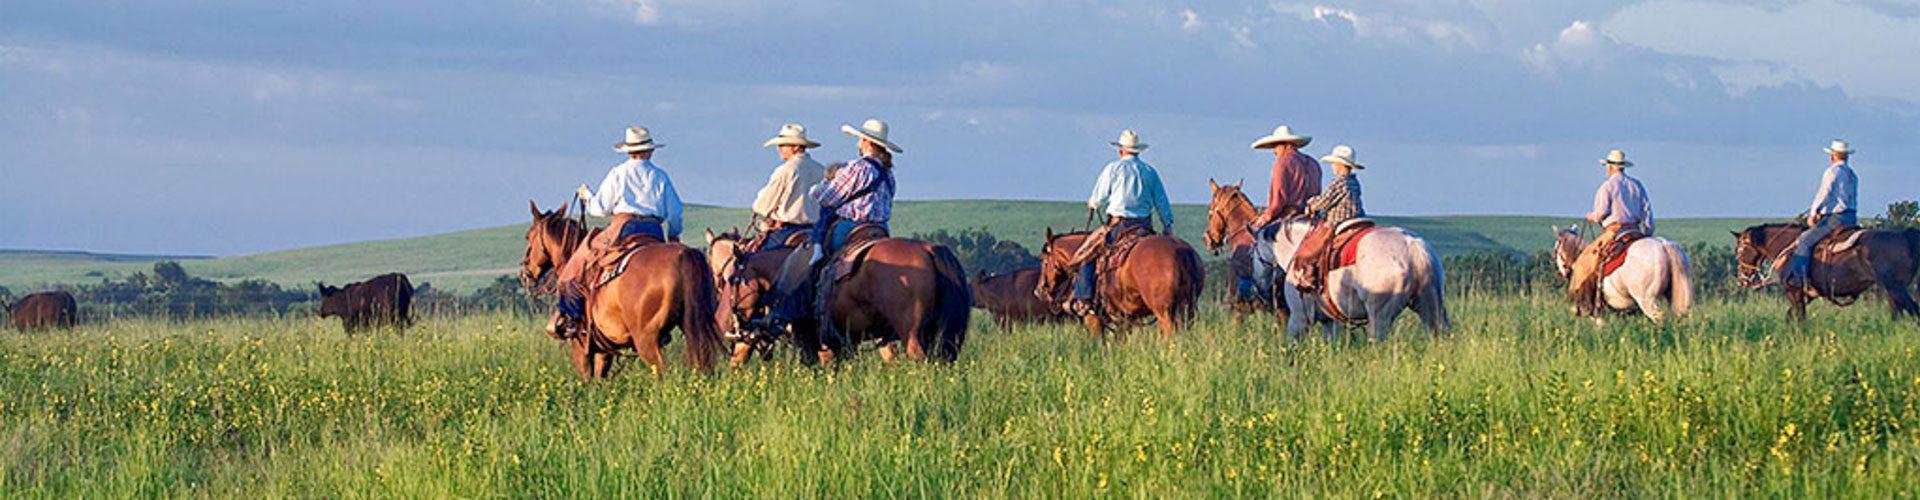 Flying W Ranch, Kansas